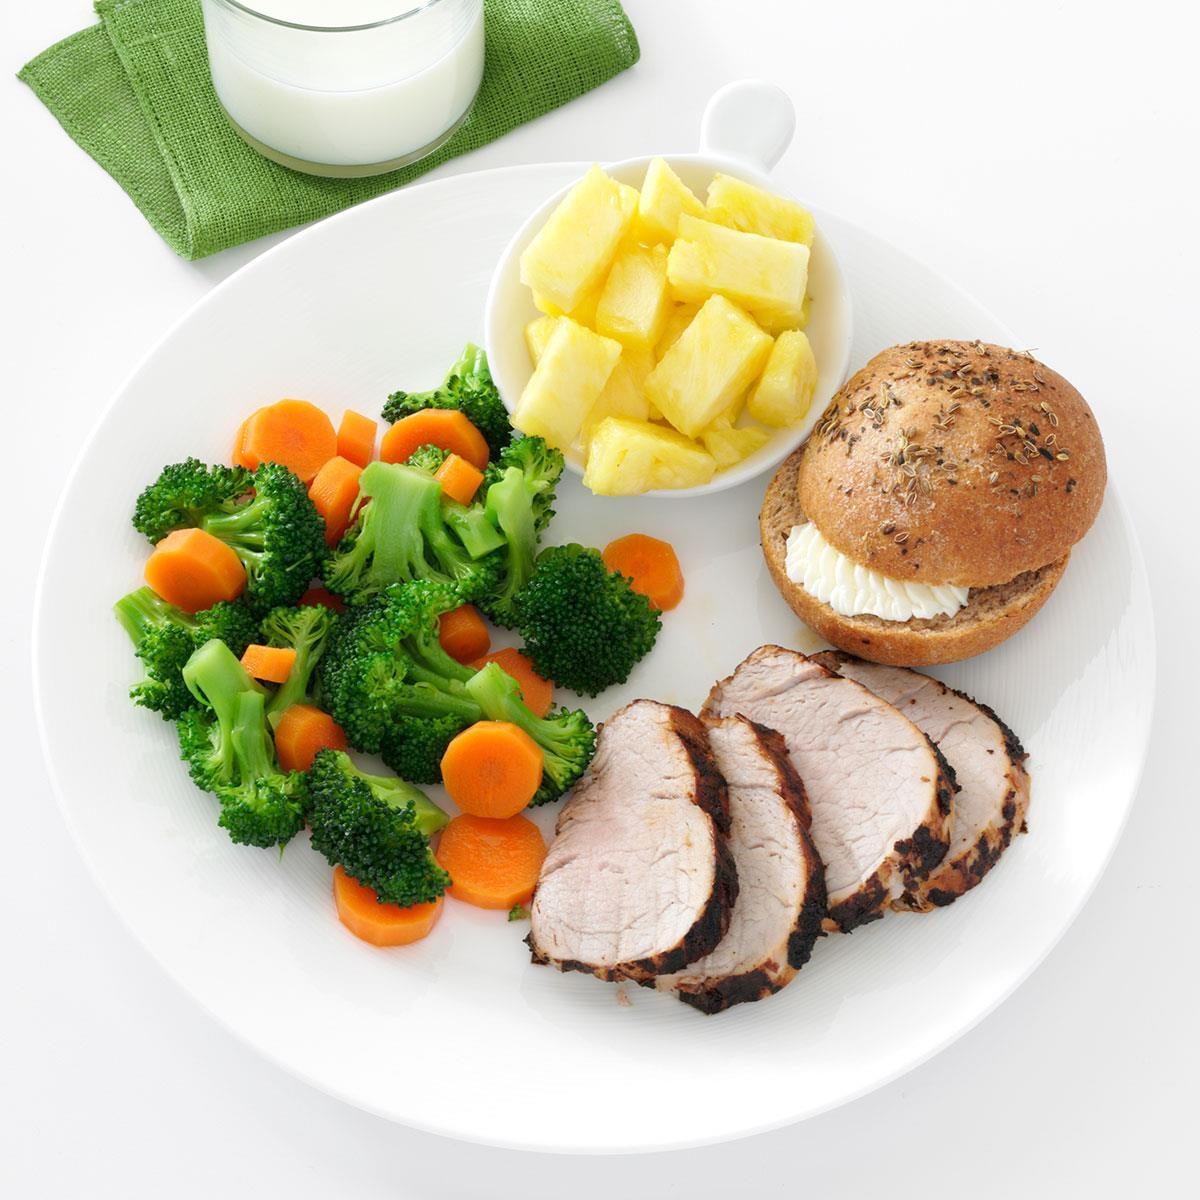 Pork Tenderloin Recipes: Chili Pork Tenderloin Recipe